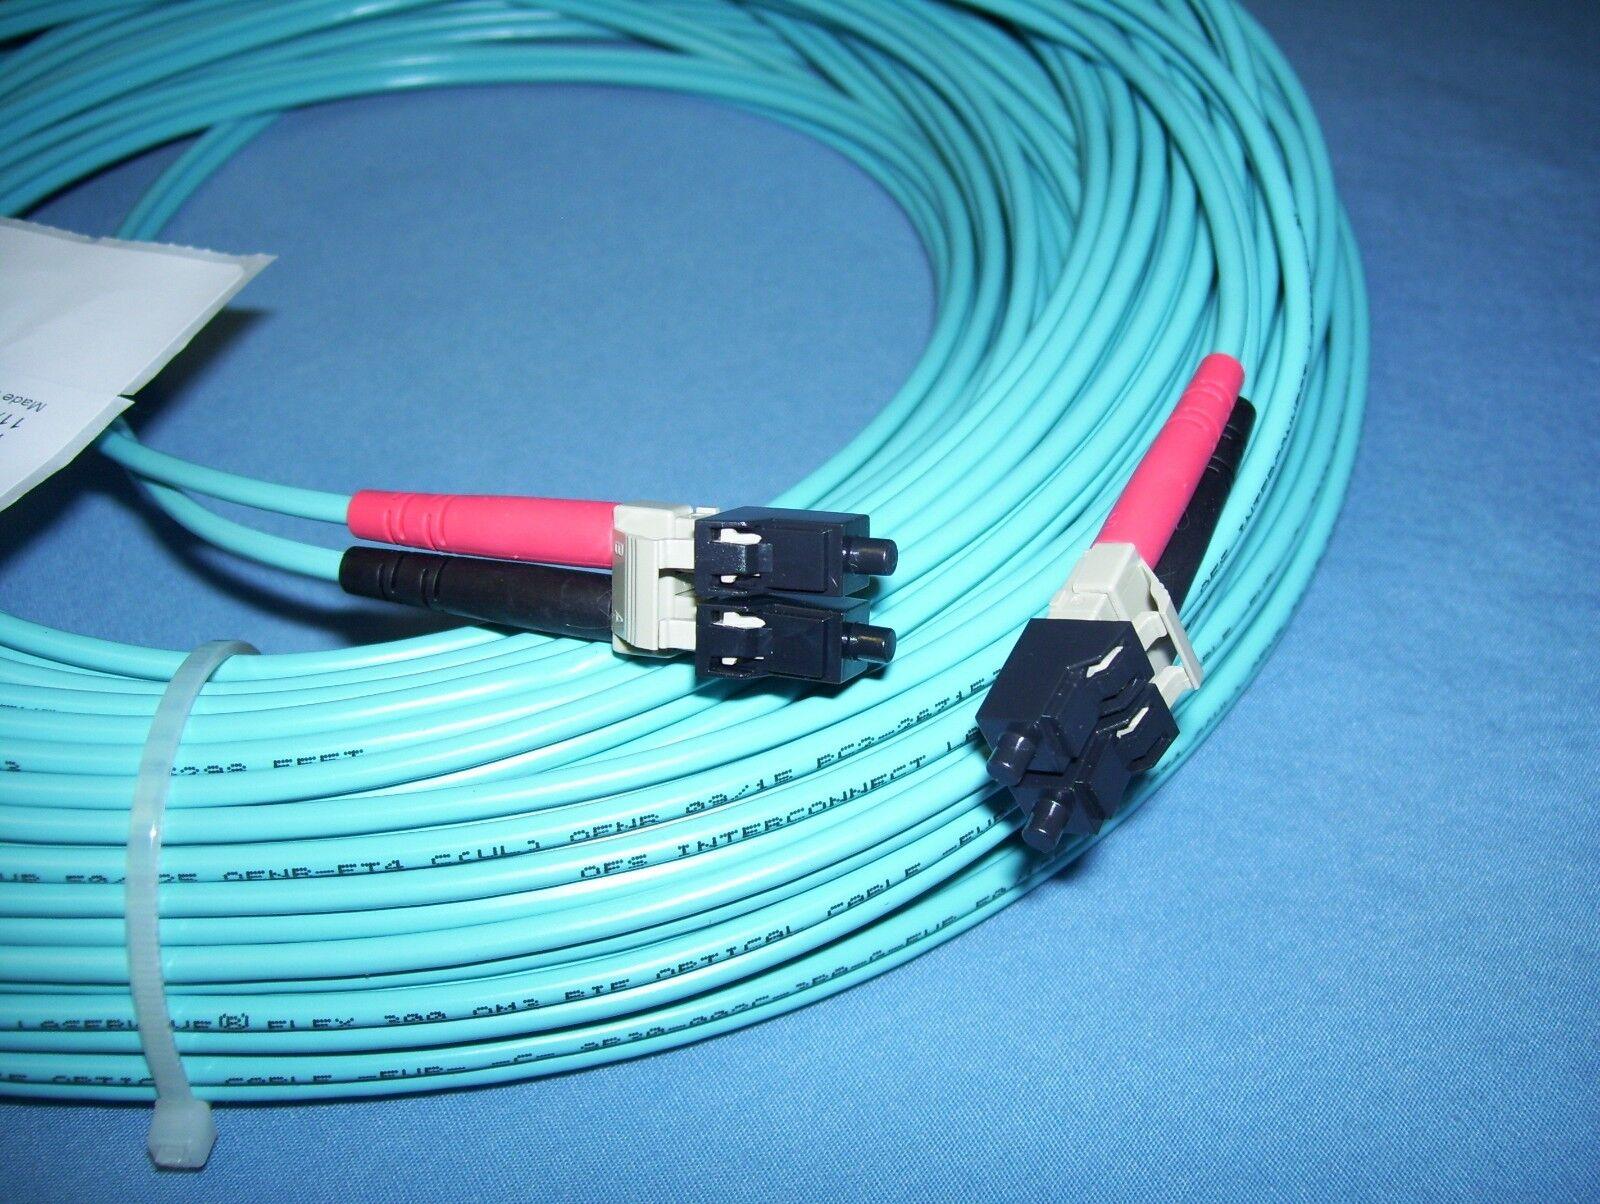 Quiktron Fiber Cord Q Series 120 FT Duplex 50um 10gig 7016279 | eBay